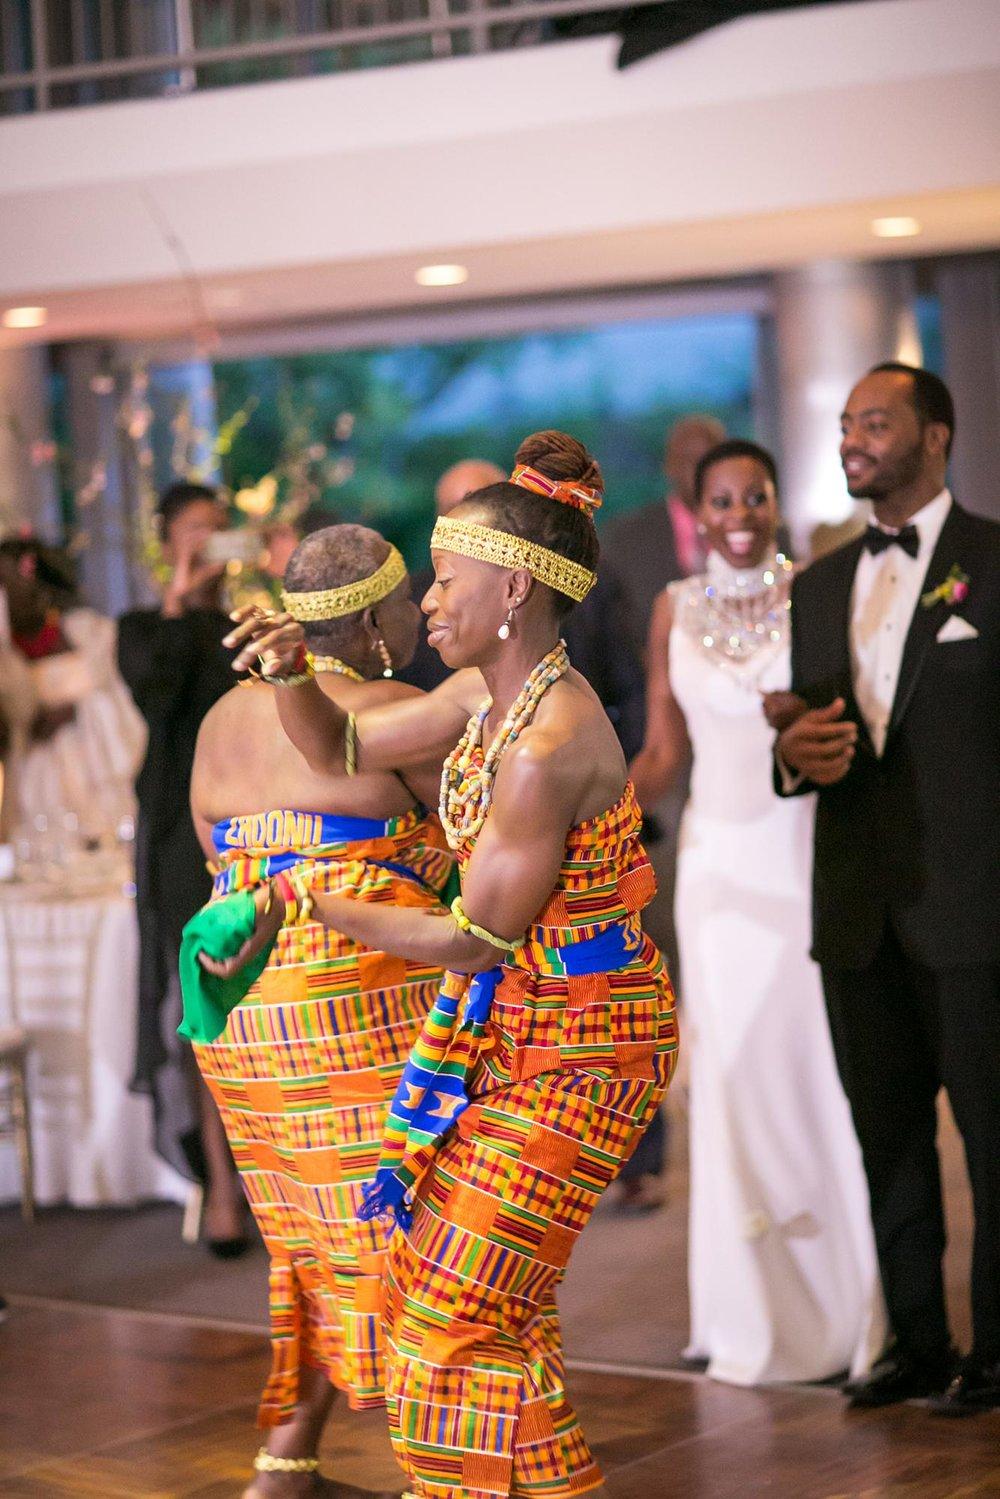 Skirball Cultural Center Wedding | Miki & Sonja Photography | mikiandsonja.com